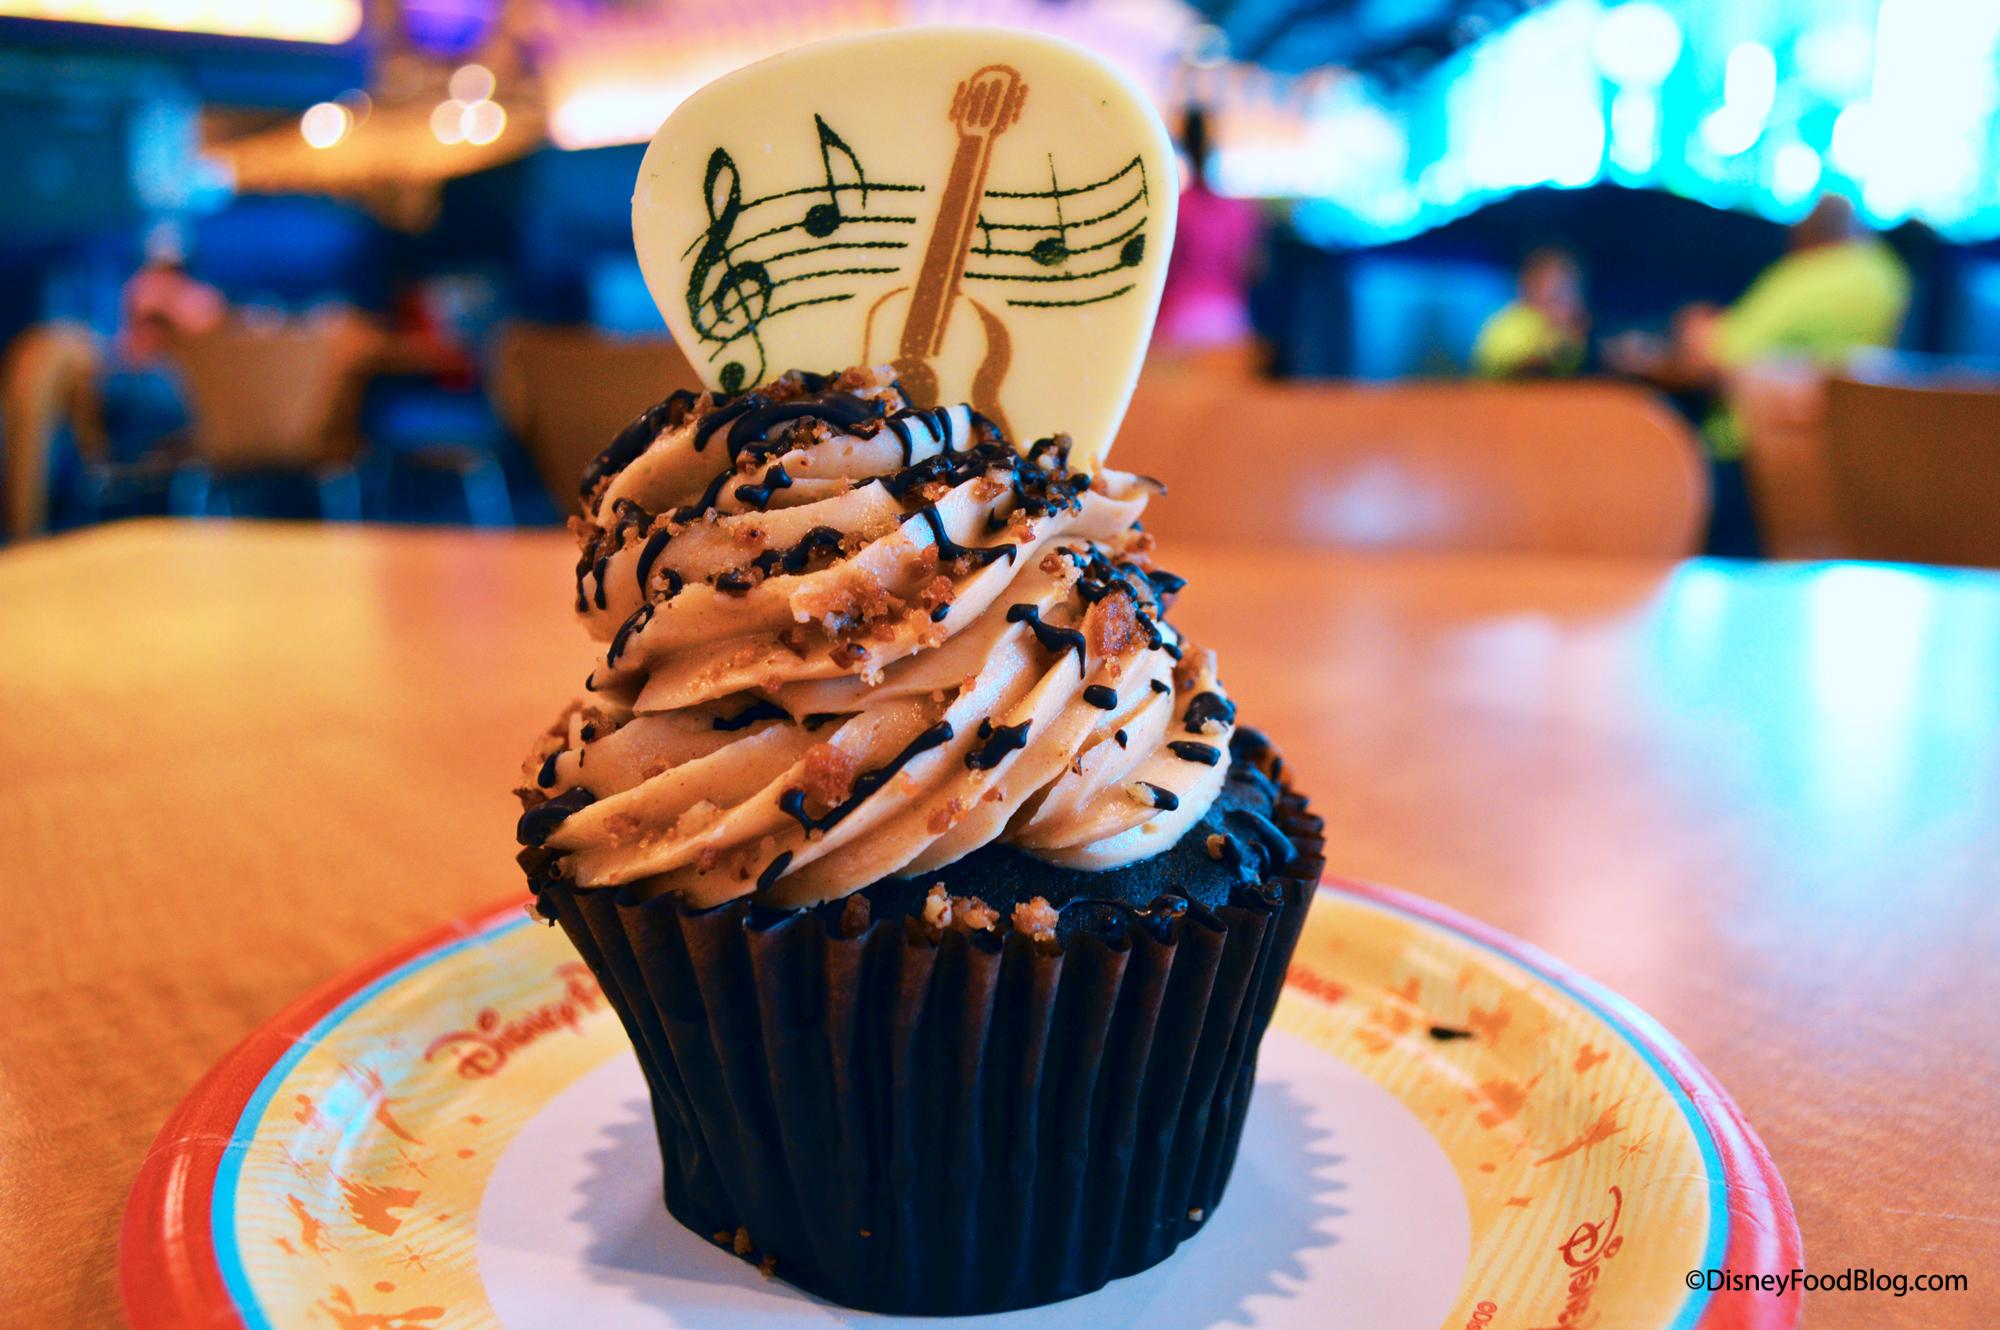 #OnTheList: The King Cupcake At Disney World's Pop Century